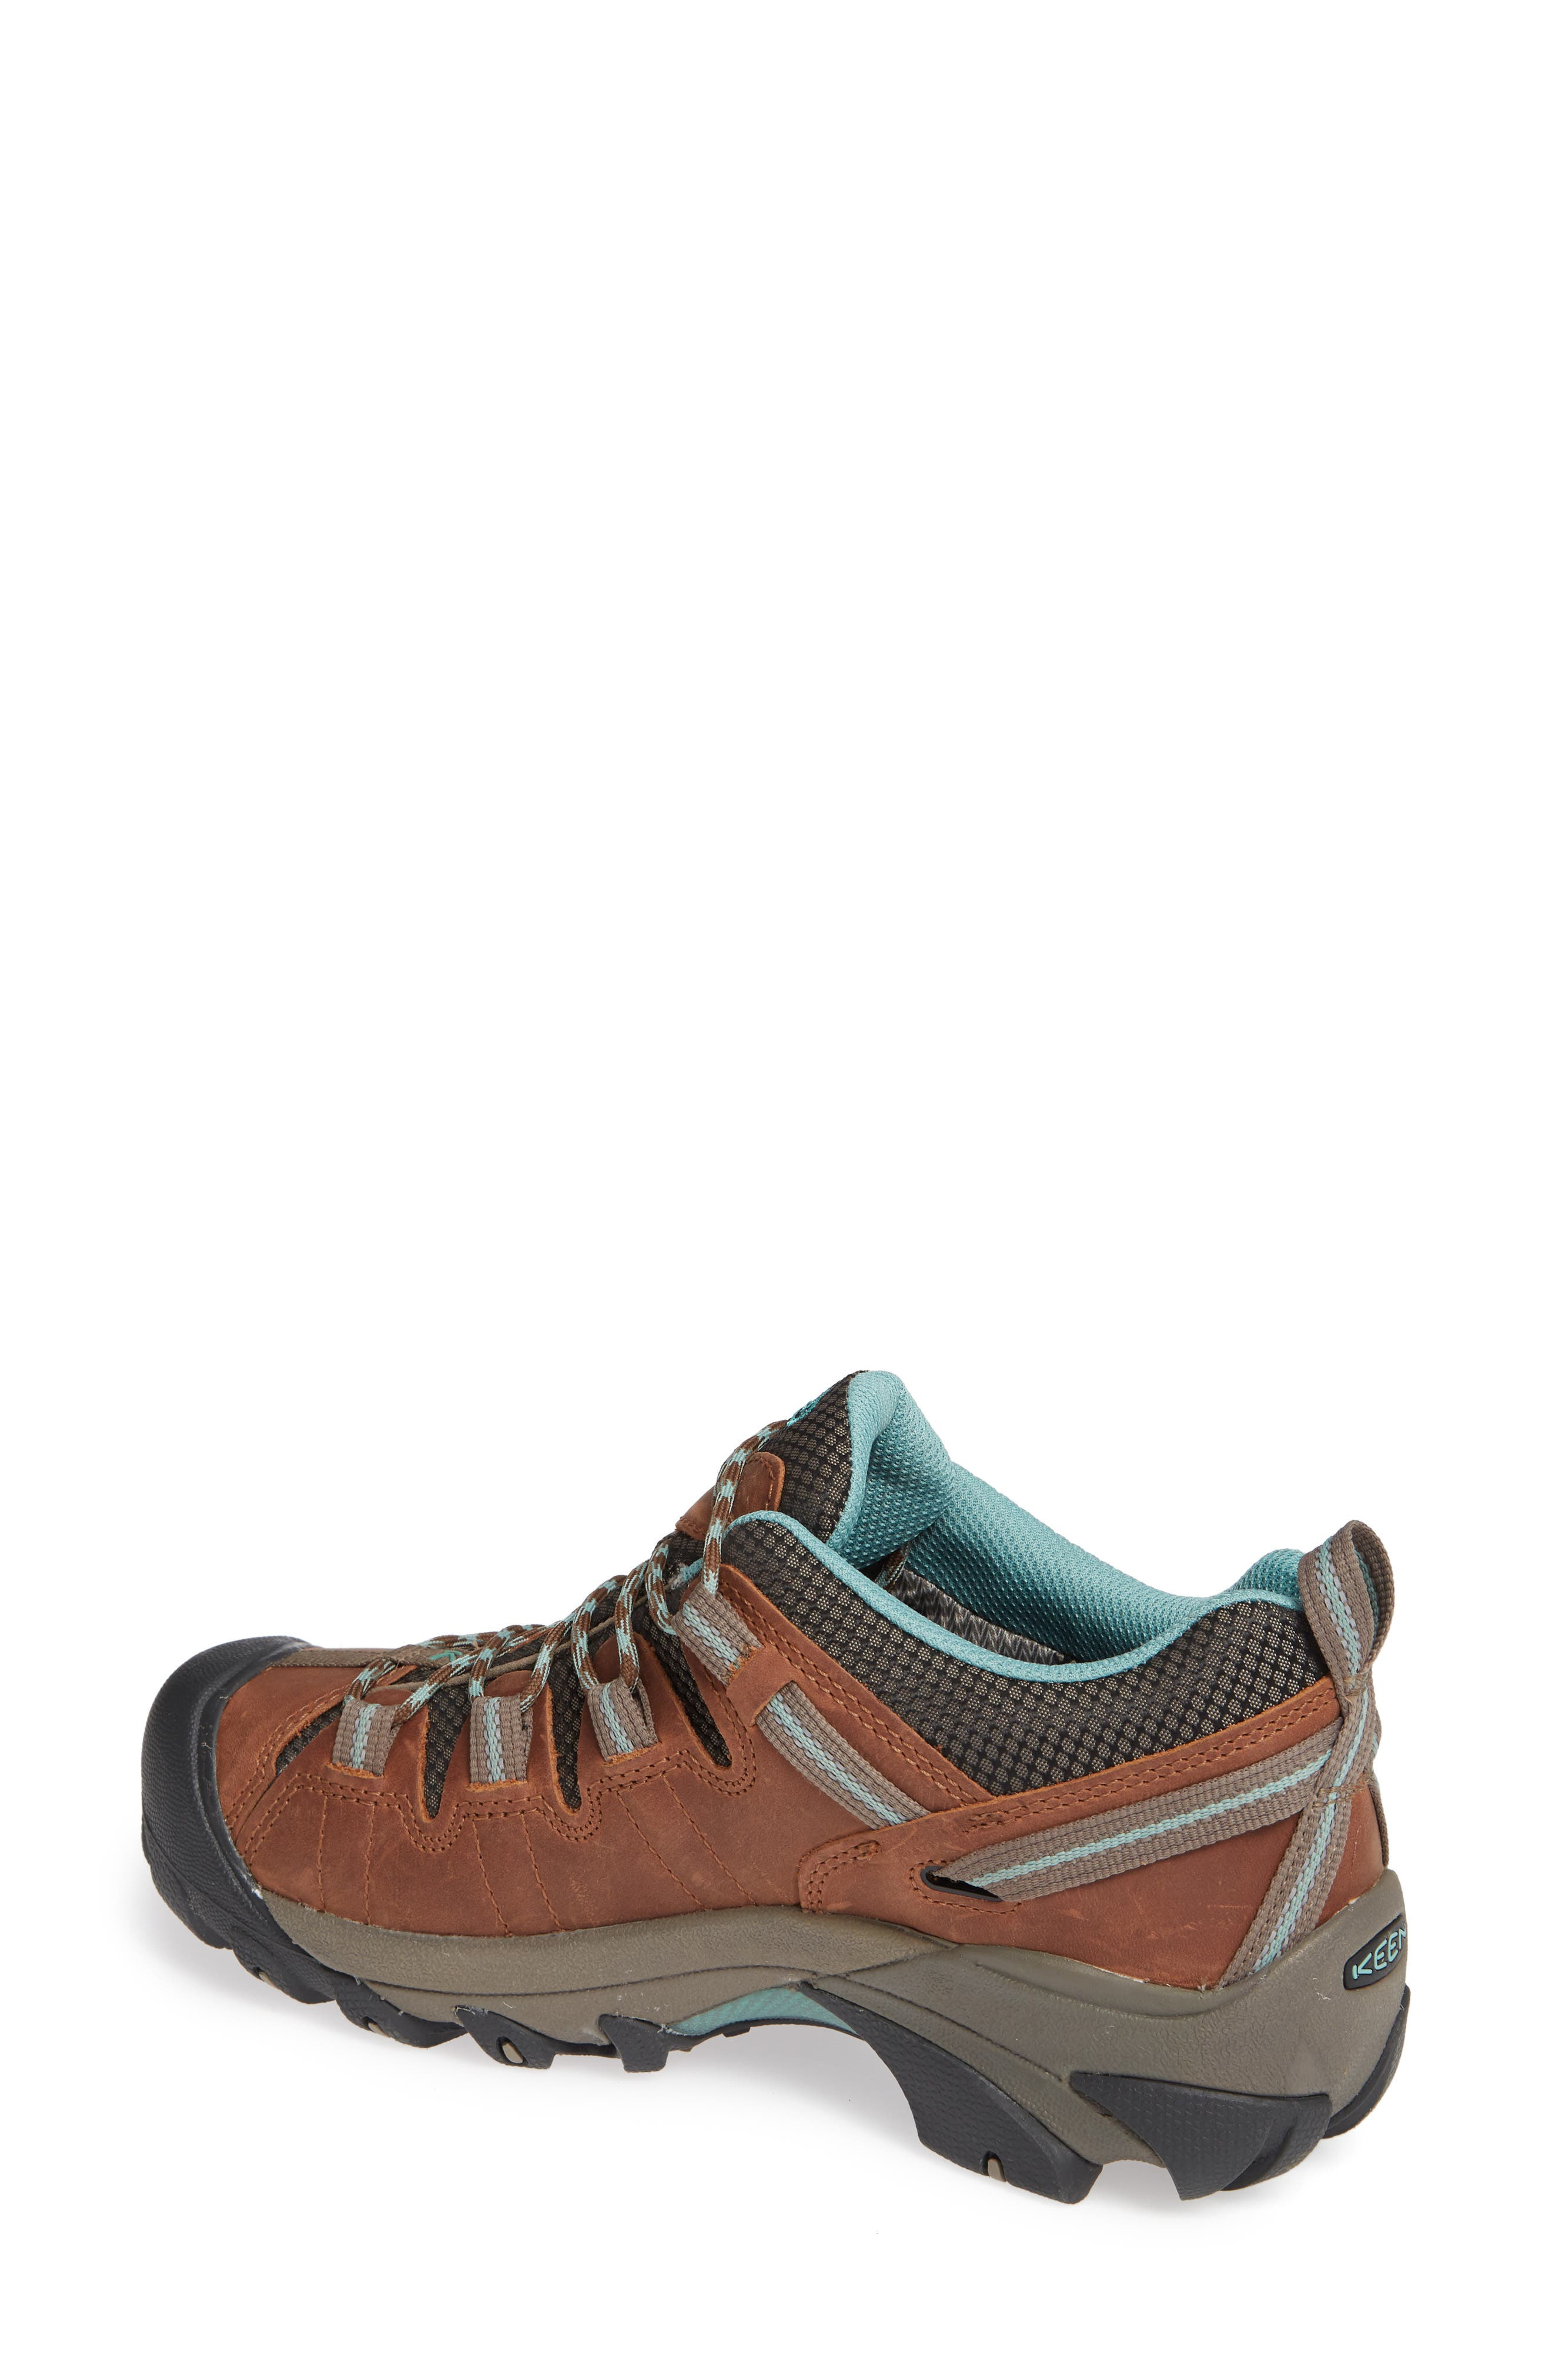 'Targhee II' Walking Shoe,                             Alternate thumbnail 2, color,                             DARK EARTH/ WASABI NUBUCK